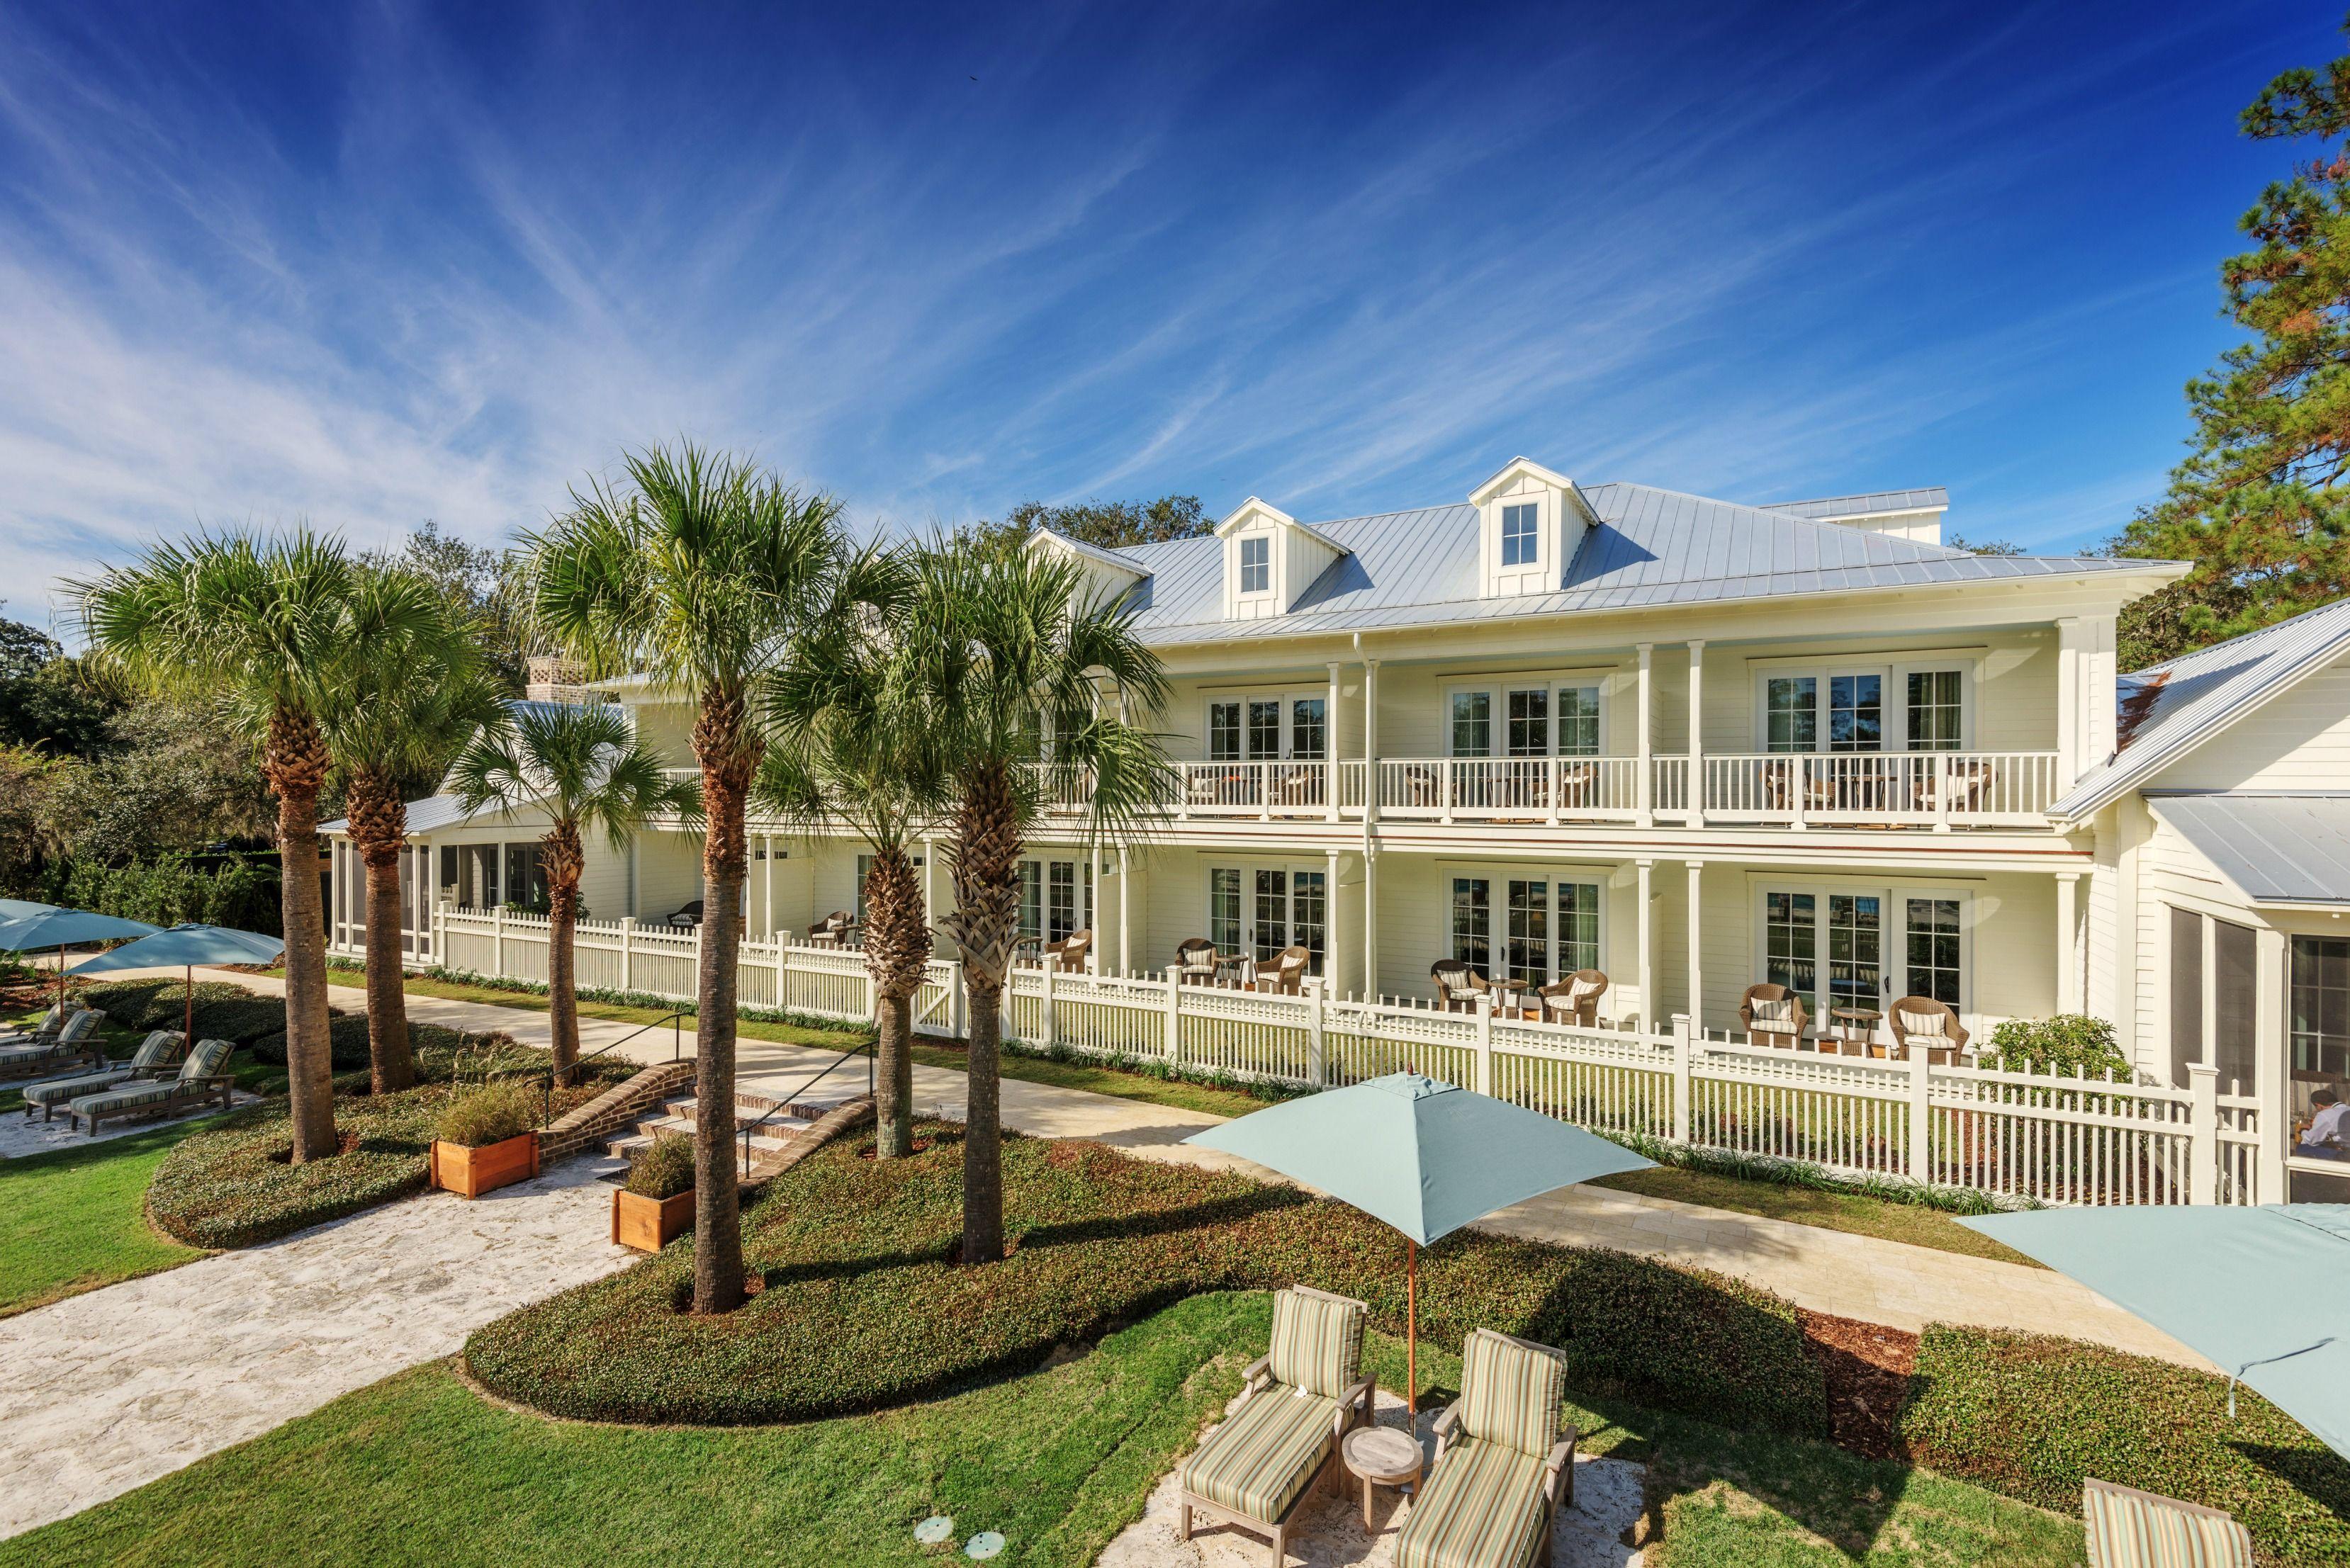 Inn at palmetto bluff lowcountry luxury montage hotel in palmetto bluff south carolina